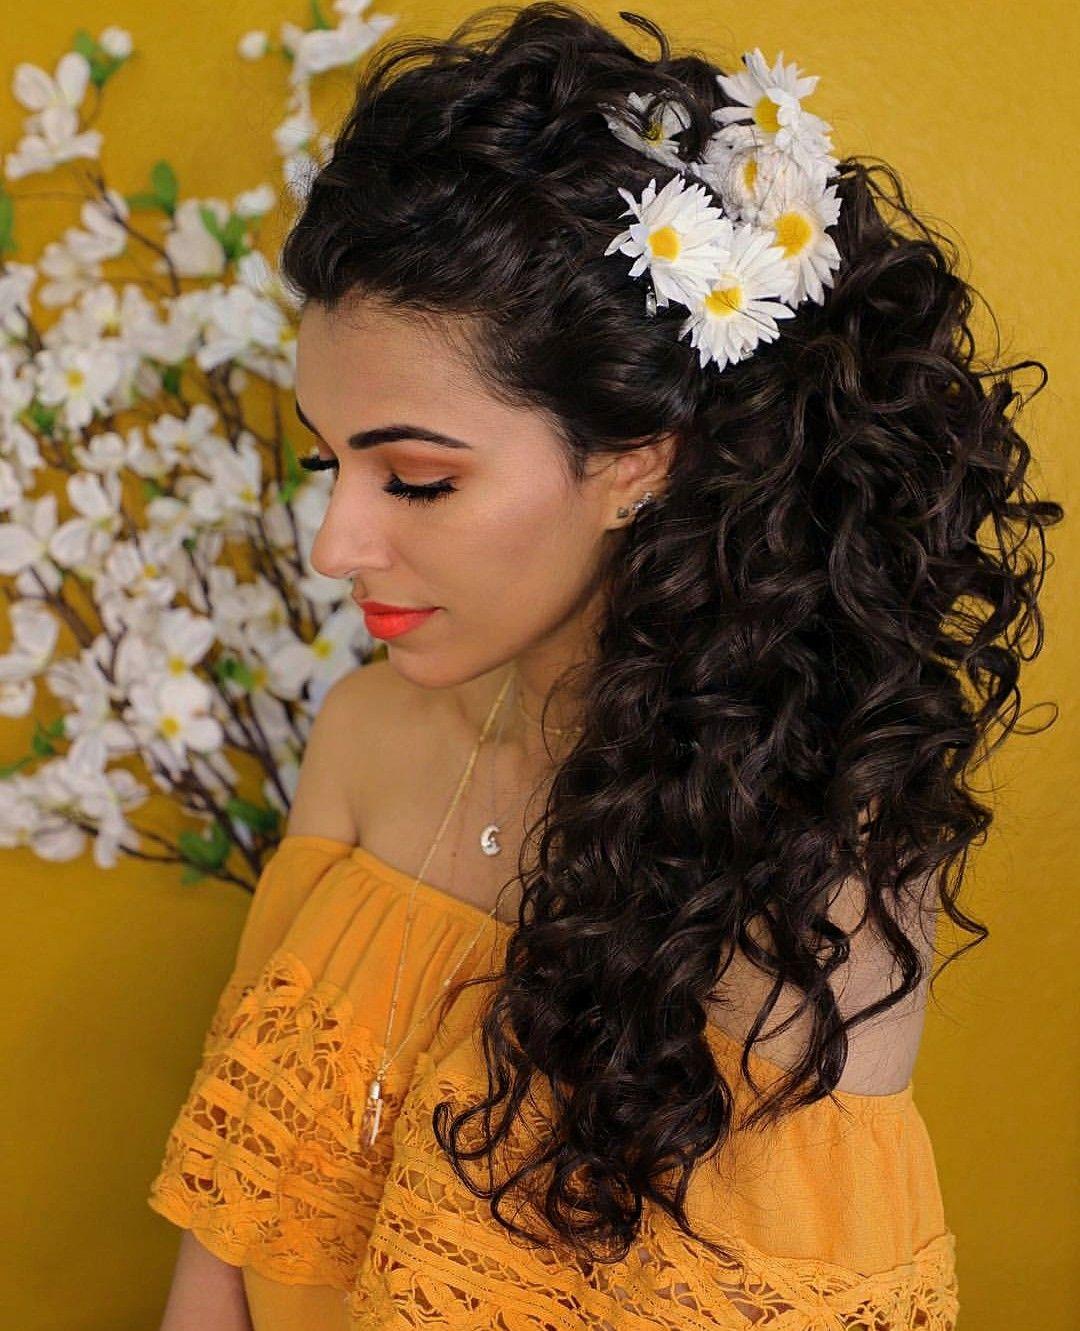 Pin by marcia soares on cute hair styles pinterest hair wedding